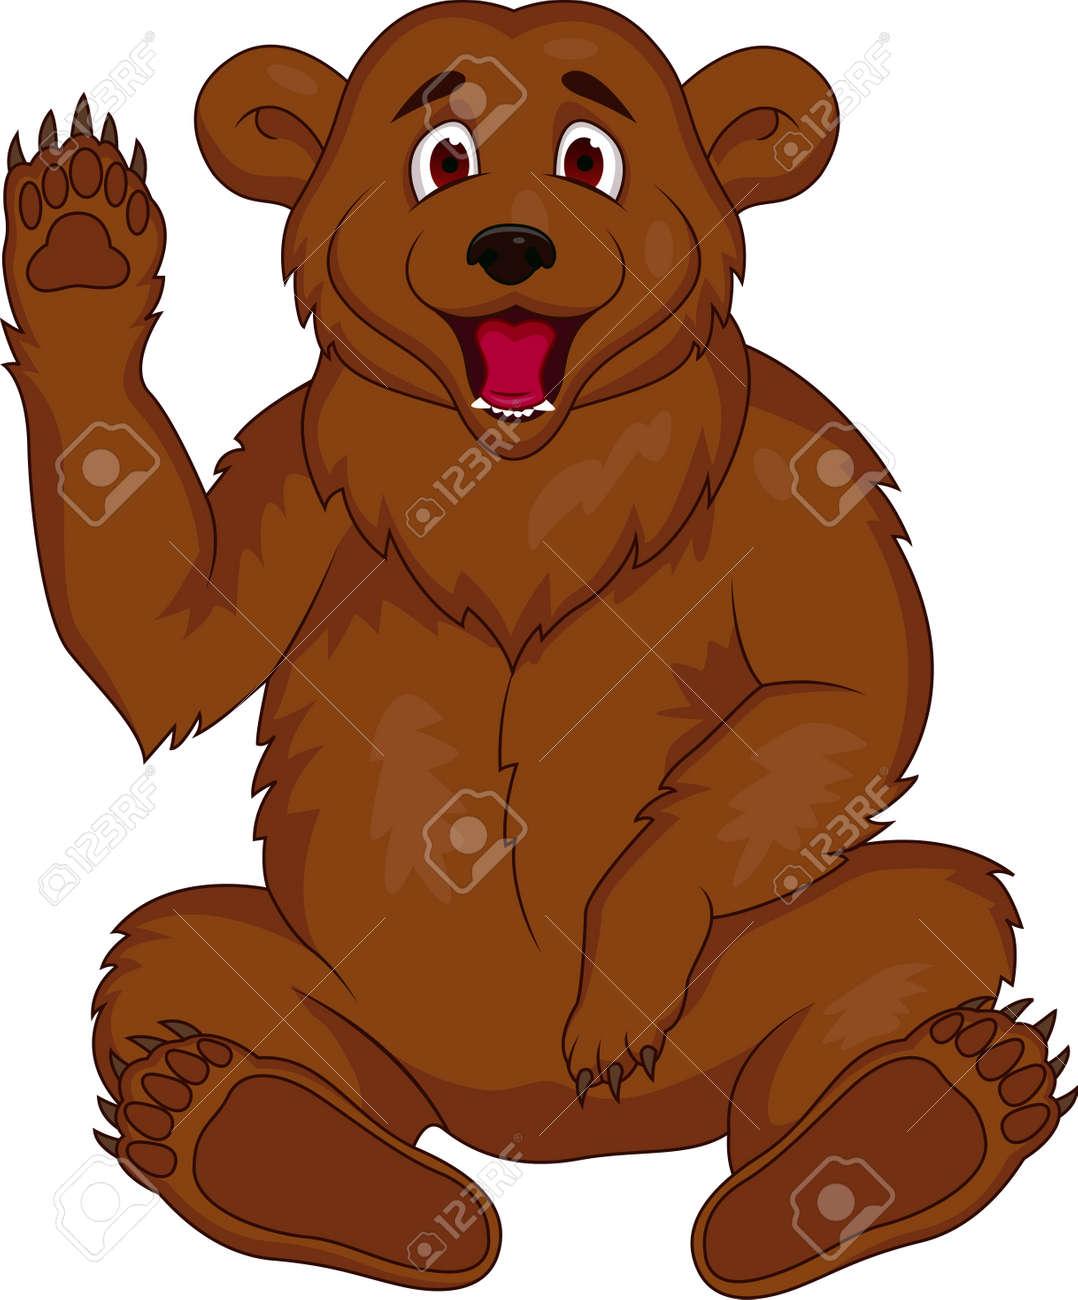 Vector illustration of brown bear cartoon Stock Vector - 13394024